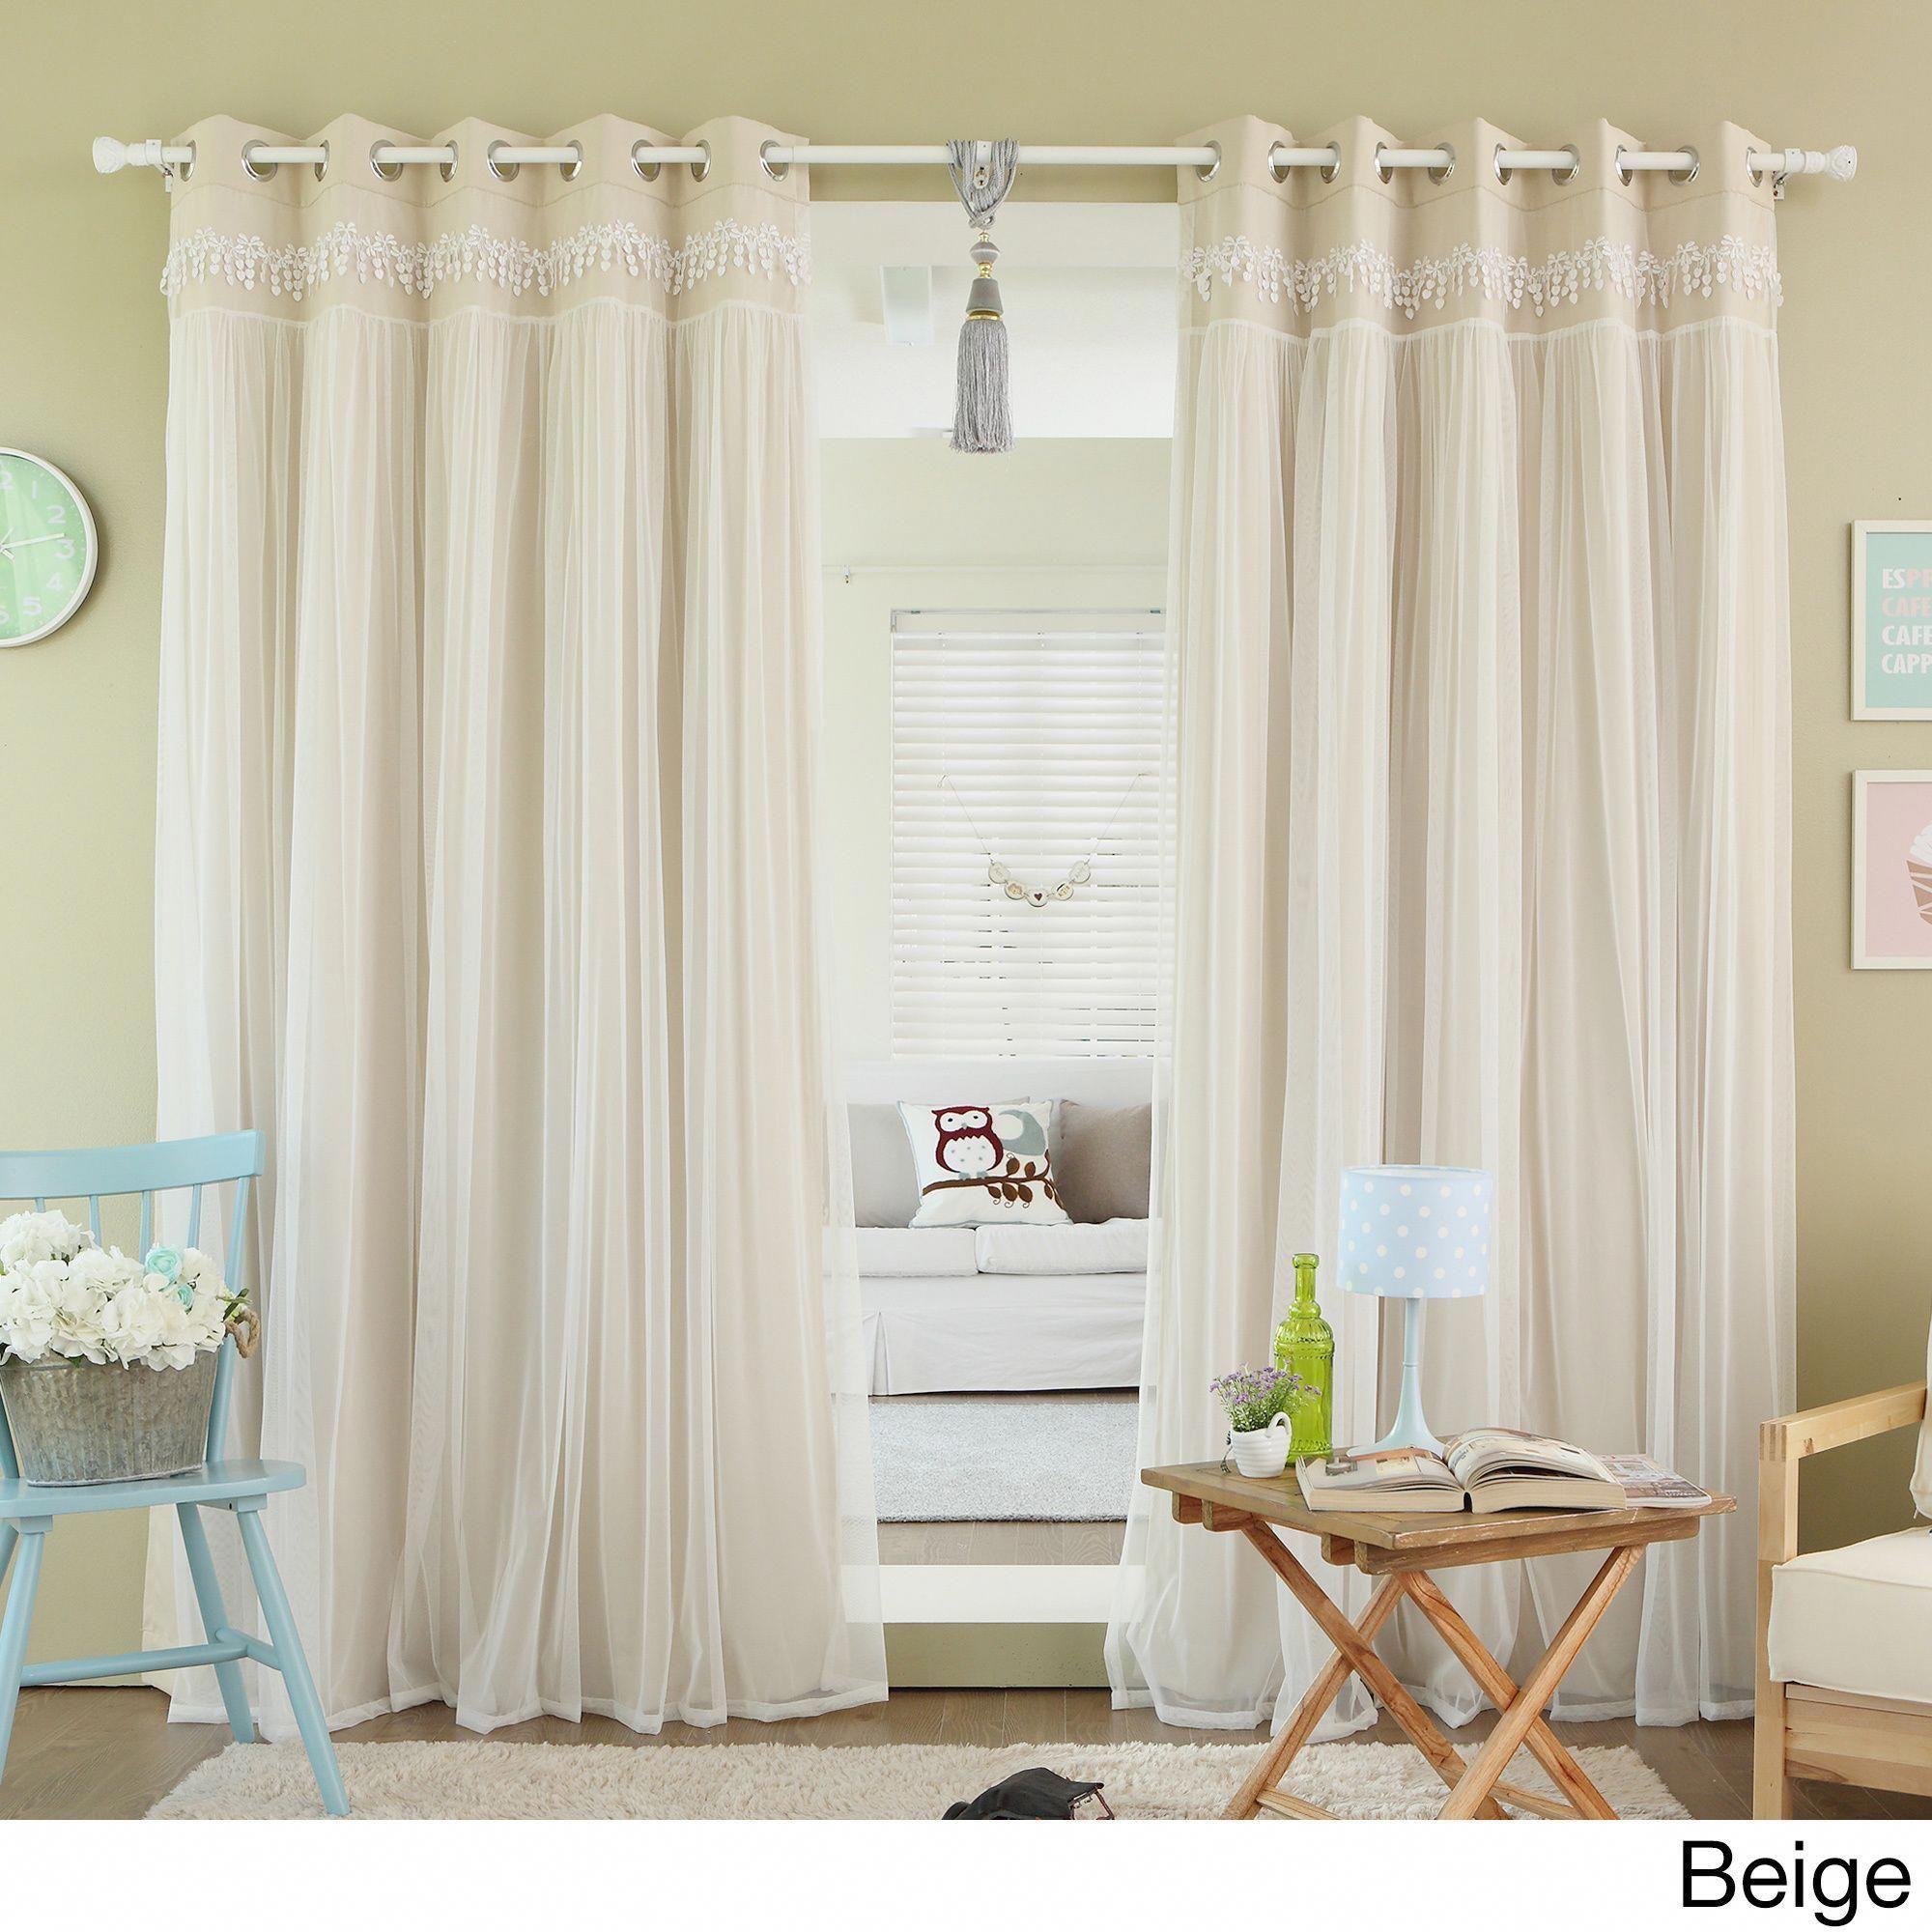 Best 3d Scenery Blackout Curtains Online Grommet Curtains Cool Curtains Panel Curtains